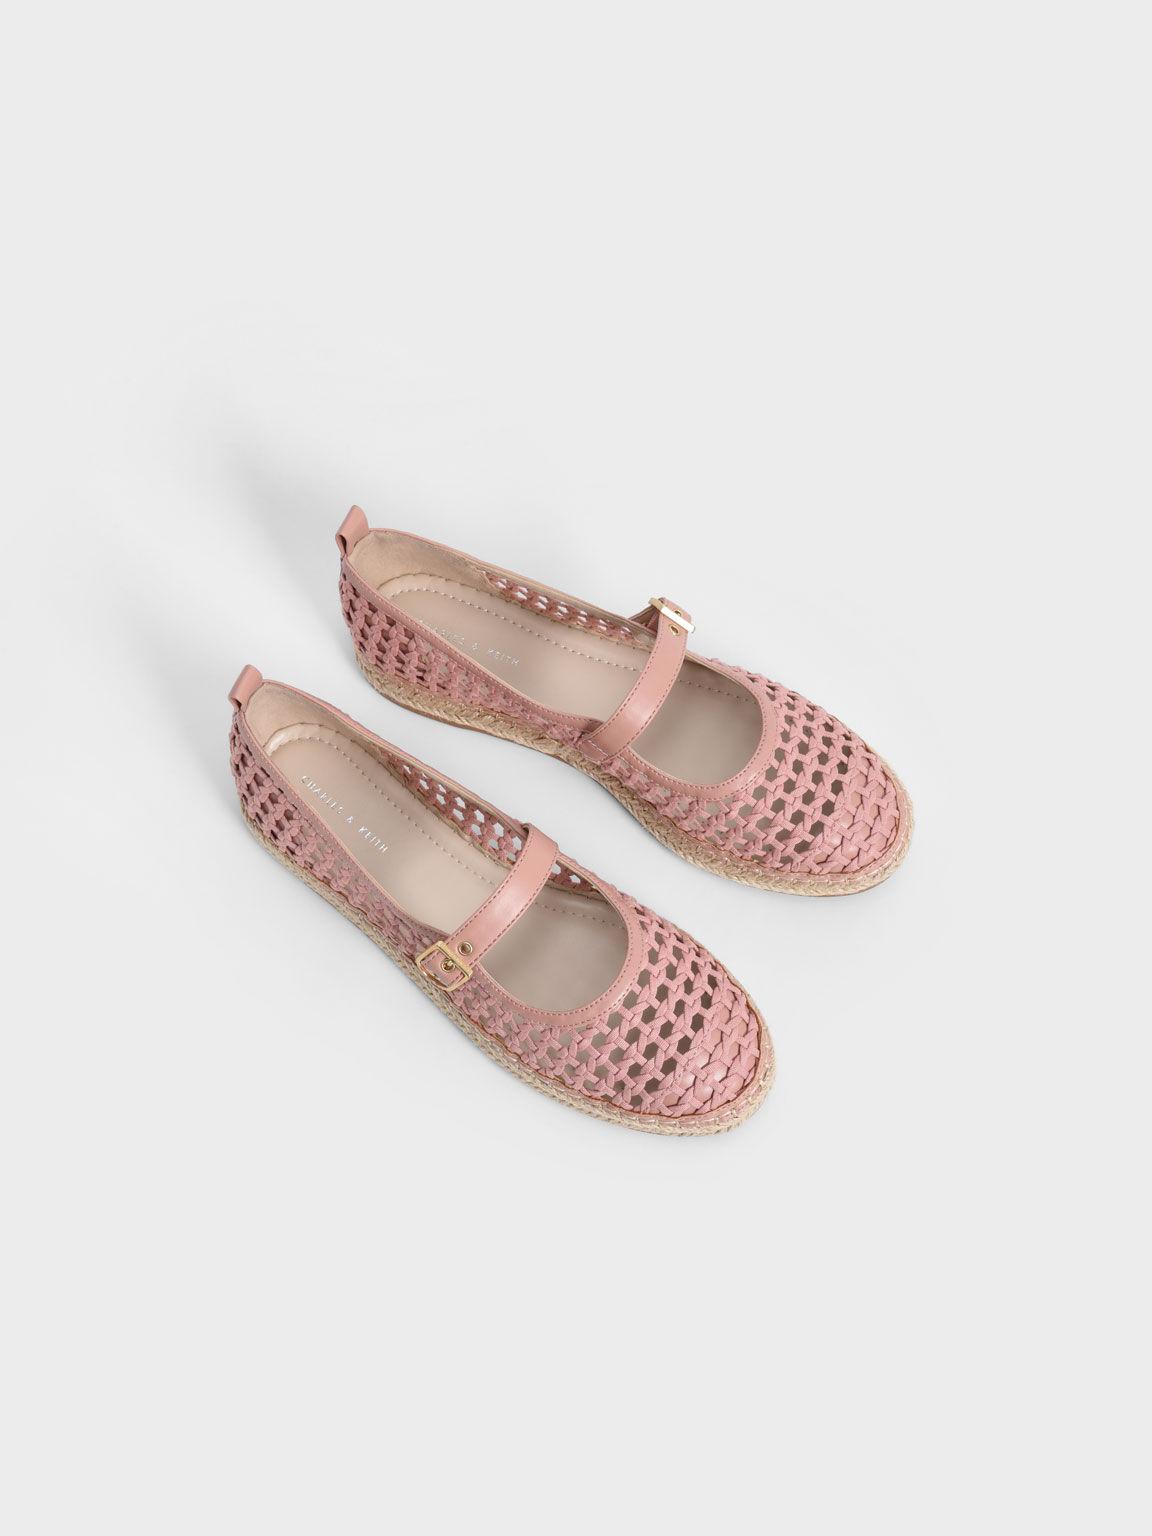 Sepatu Front Buckle Woven Canvas Espadrilles, Pink, hi-res